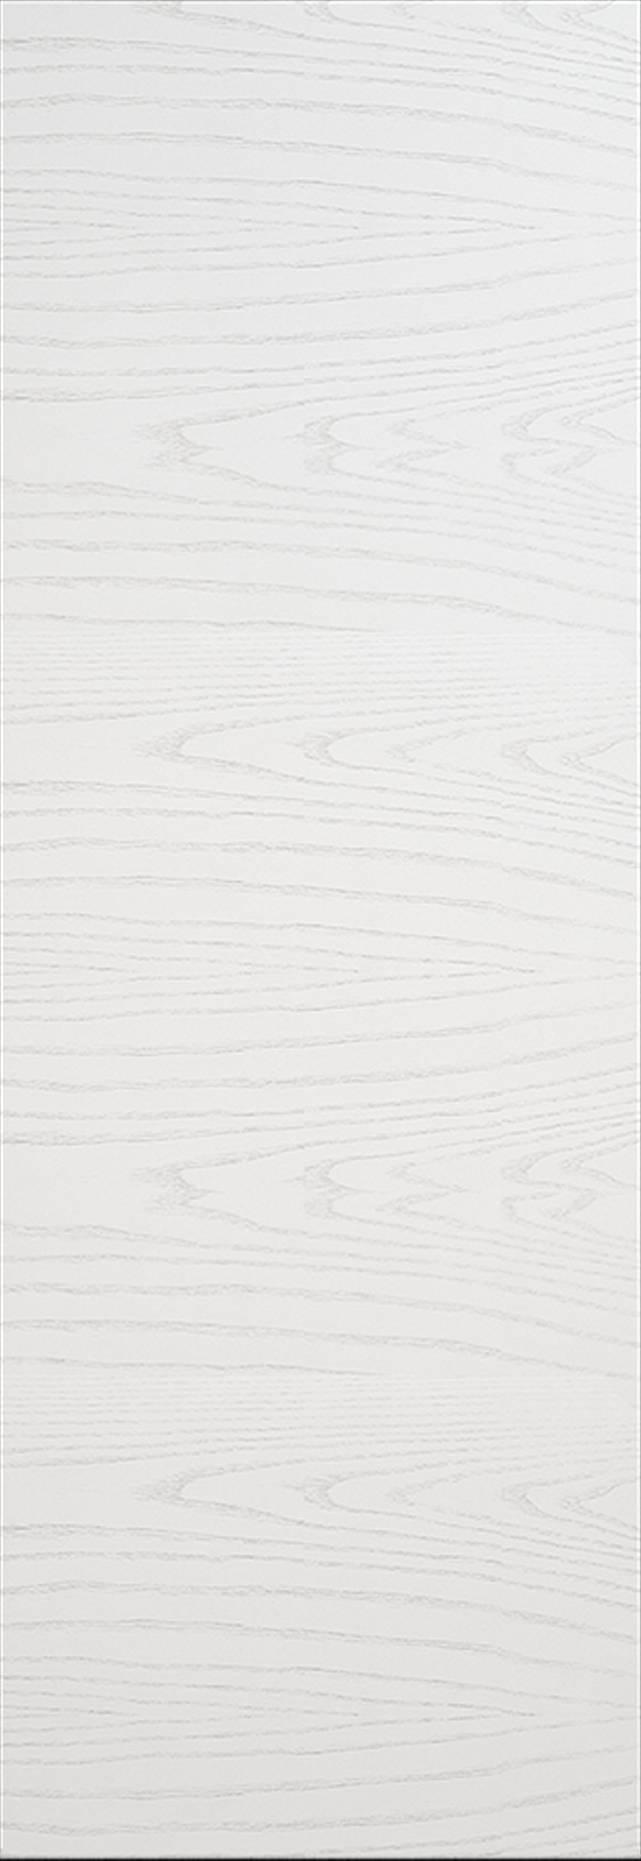 Tivoli А-2 Invisible цвет - Ясень белая эмаль Без стекла (ДГ)